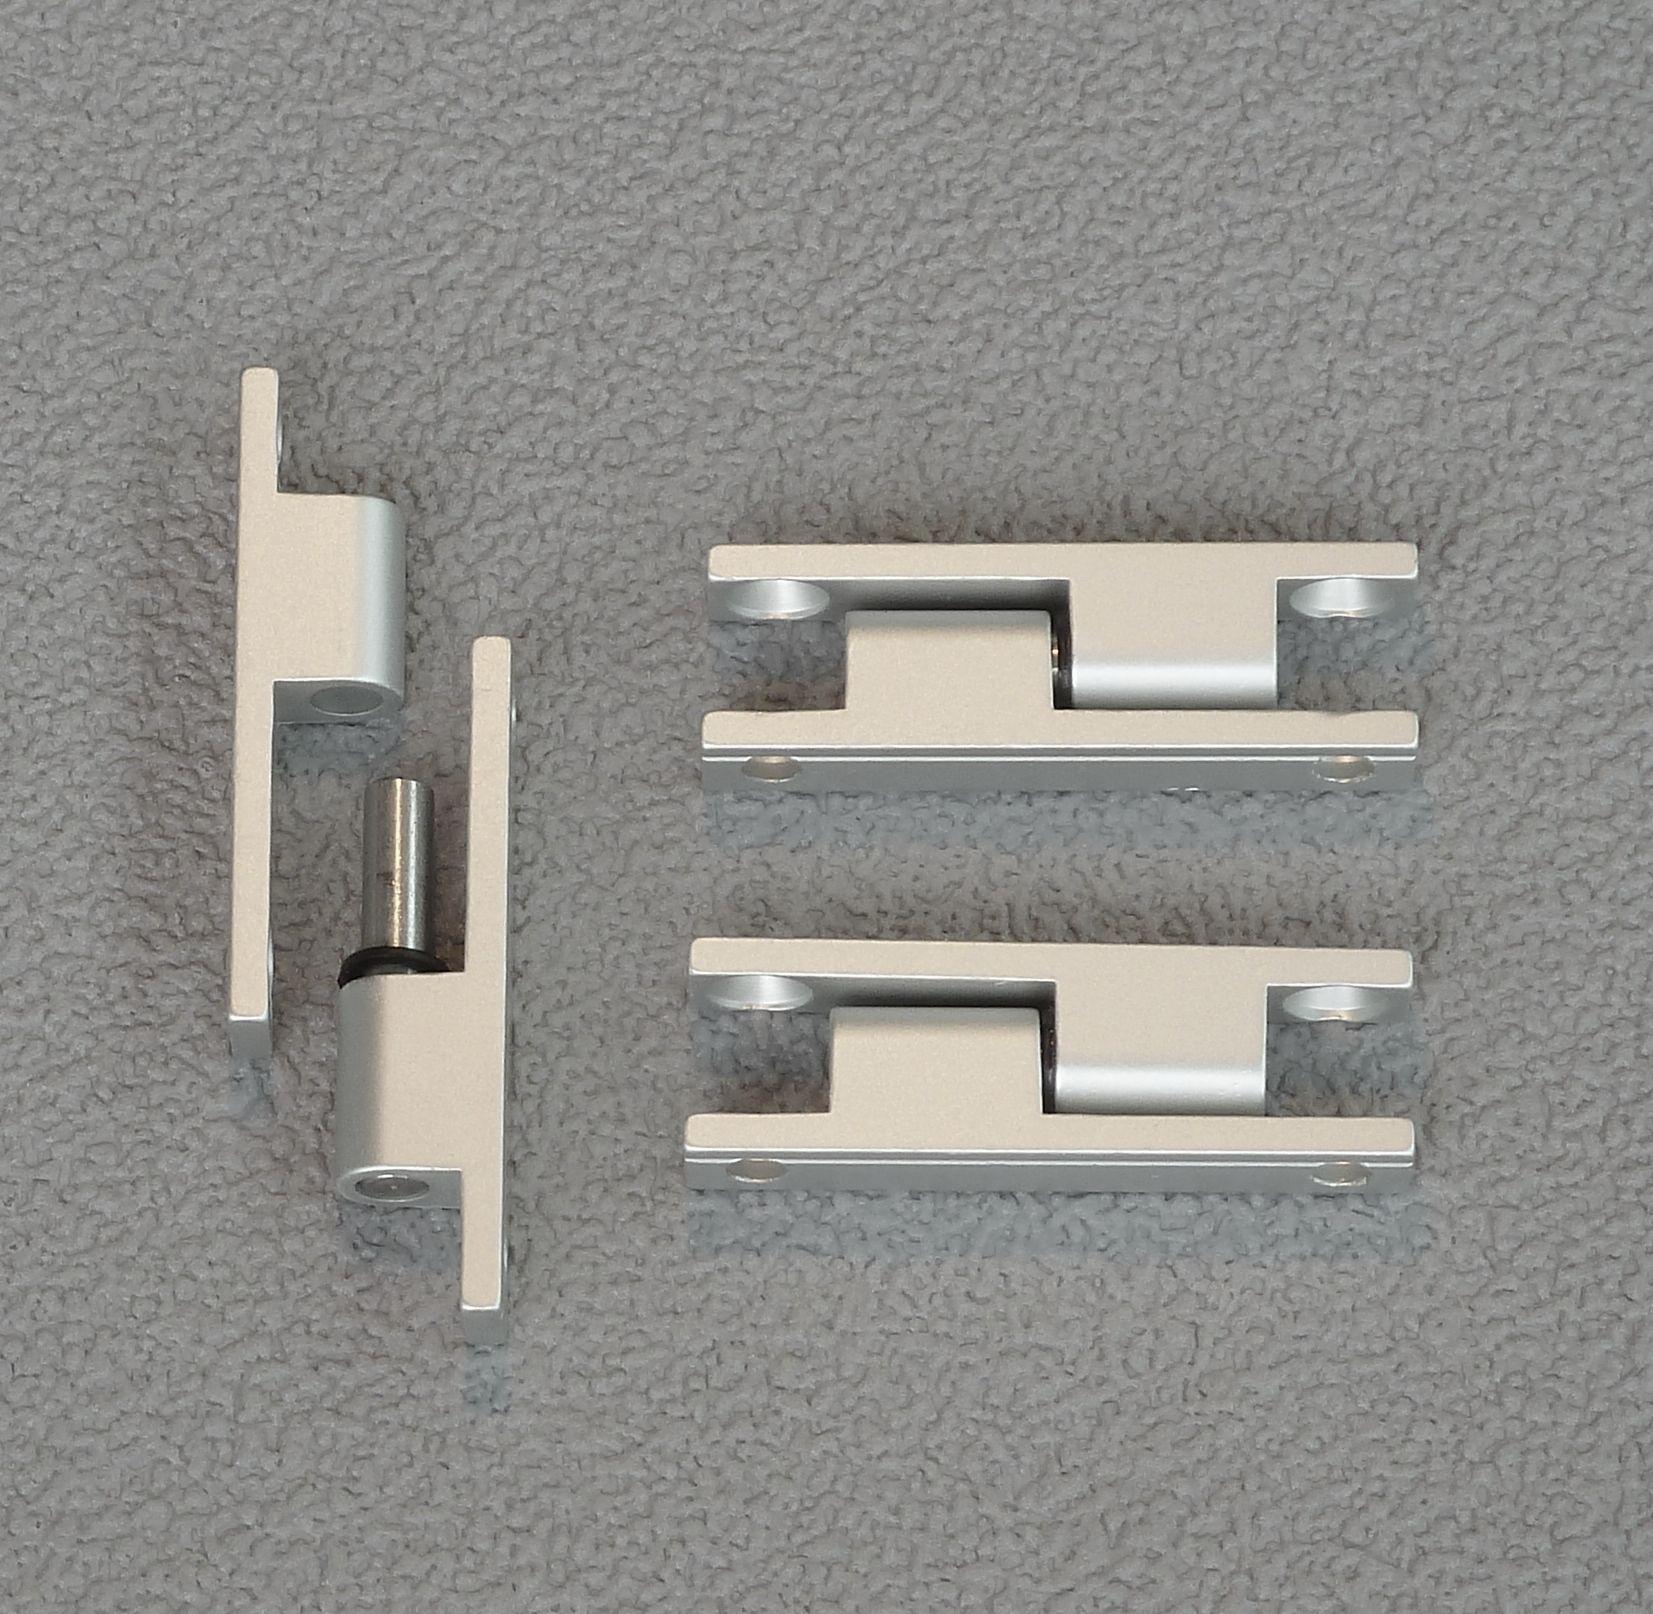 aluminium scharnier fuer fliegengitter. Black Bedroom Furniture Sets. Home Design Ideas